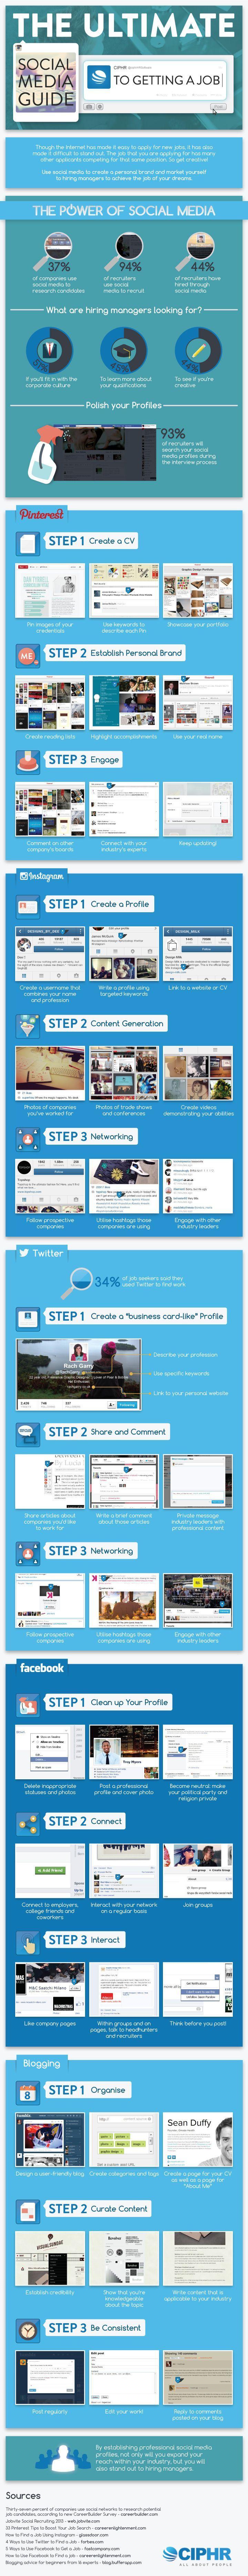 Attractive Top 7 Tips For Social Media Marketing. Career DevelopmentProfessional ...